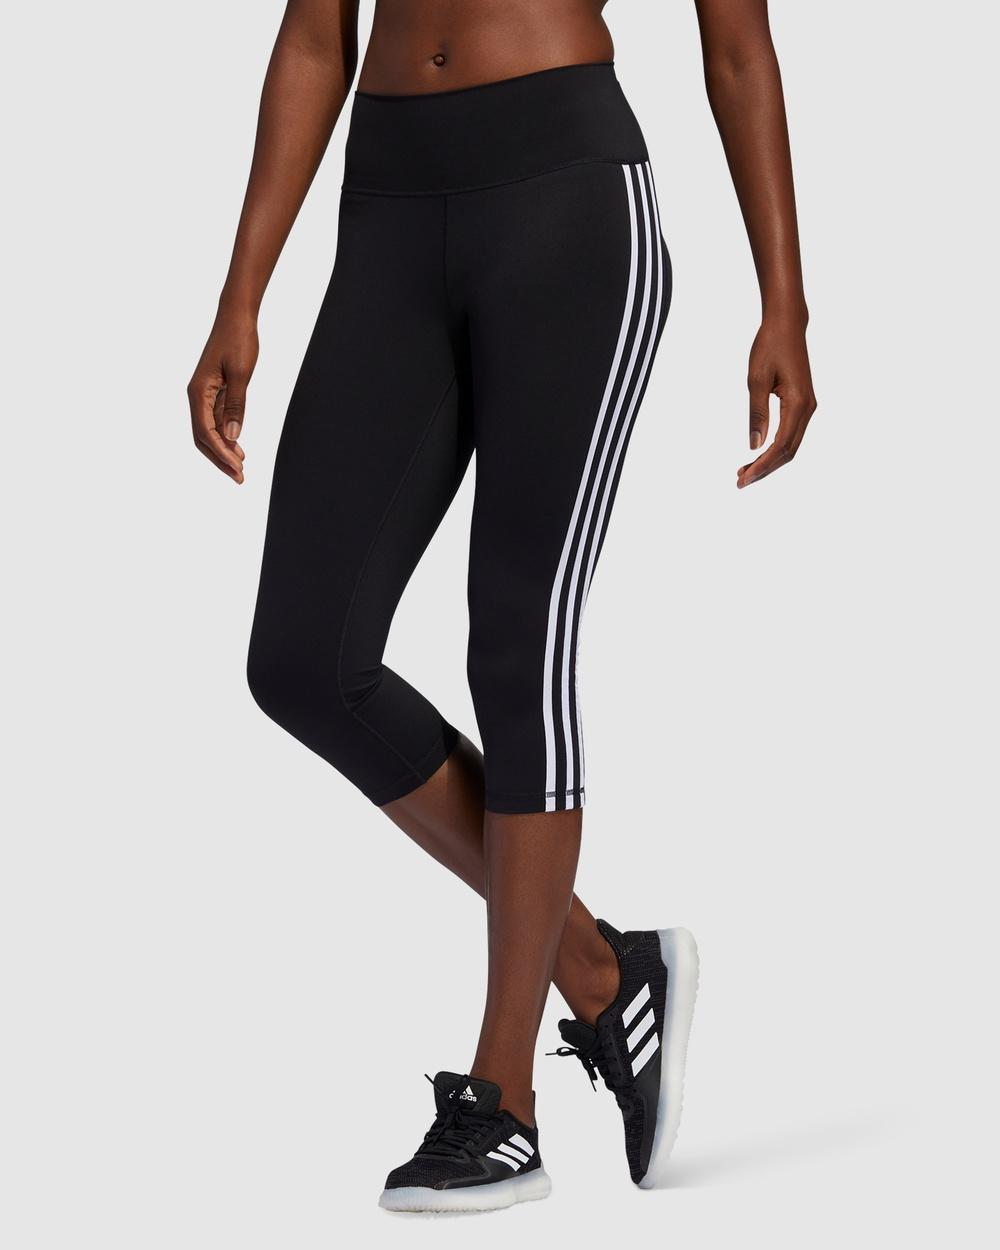 adidas Performance Believe This 2.0 3 Stripes 4 Tights Sports Black 3-Stripes 3-4